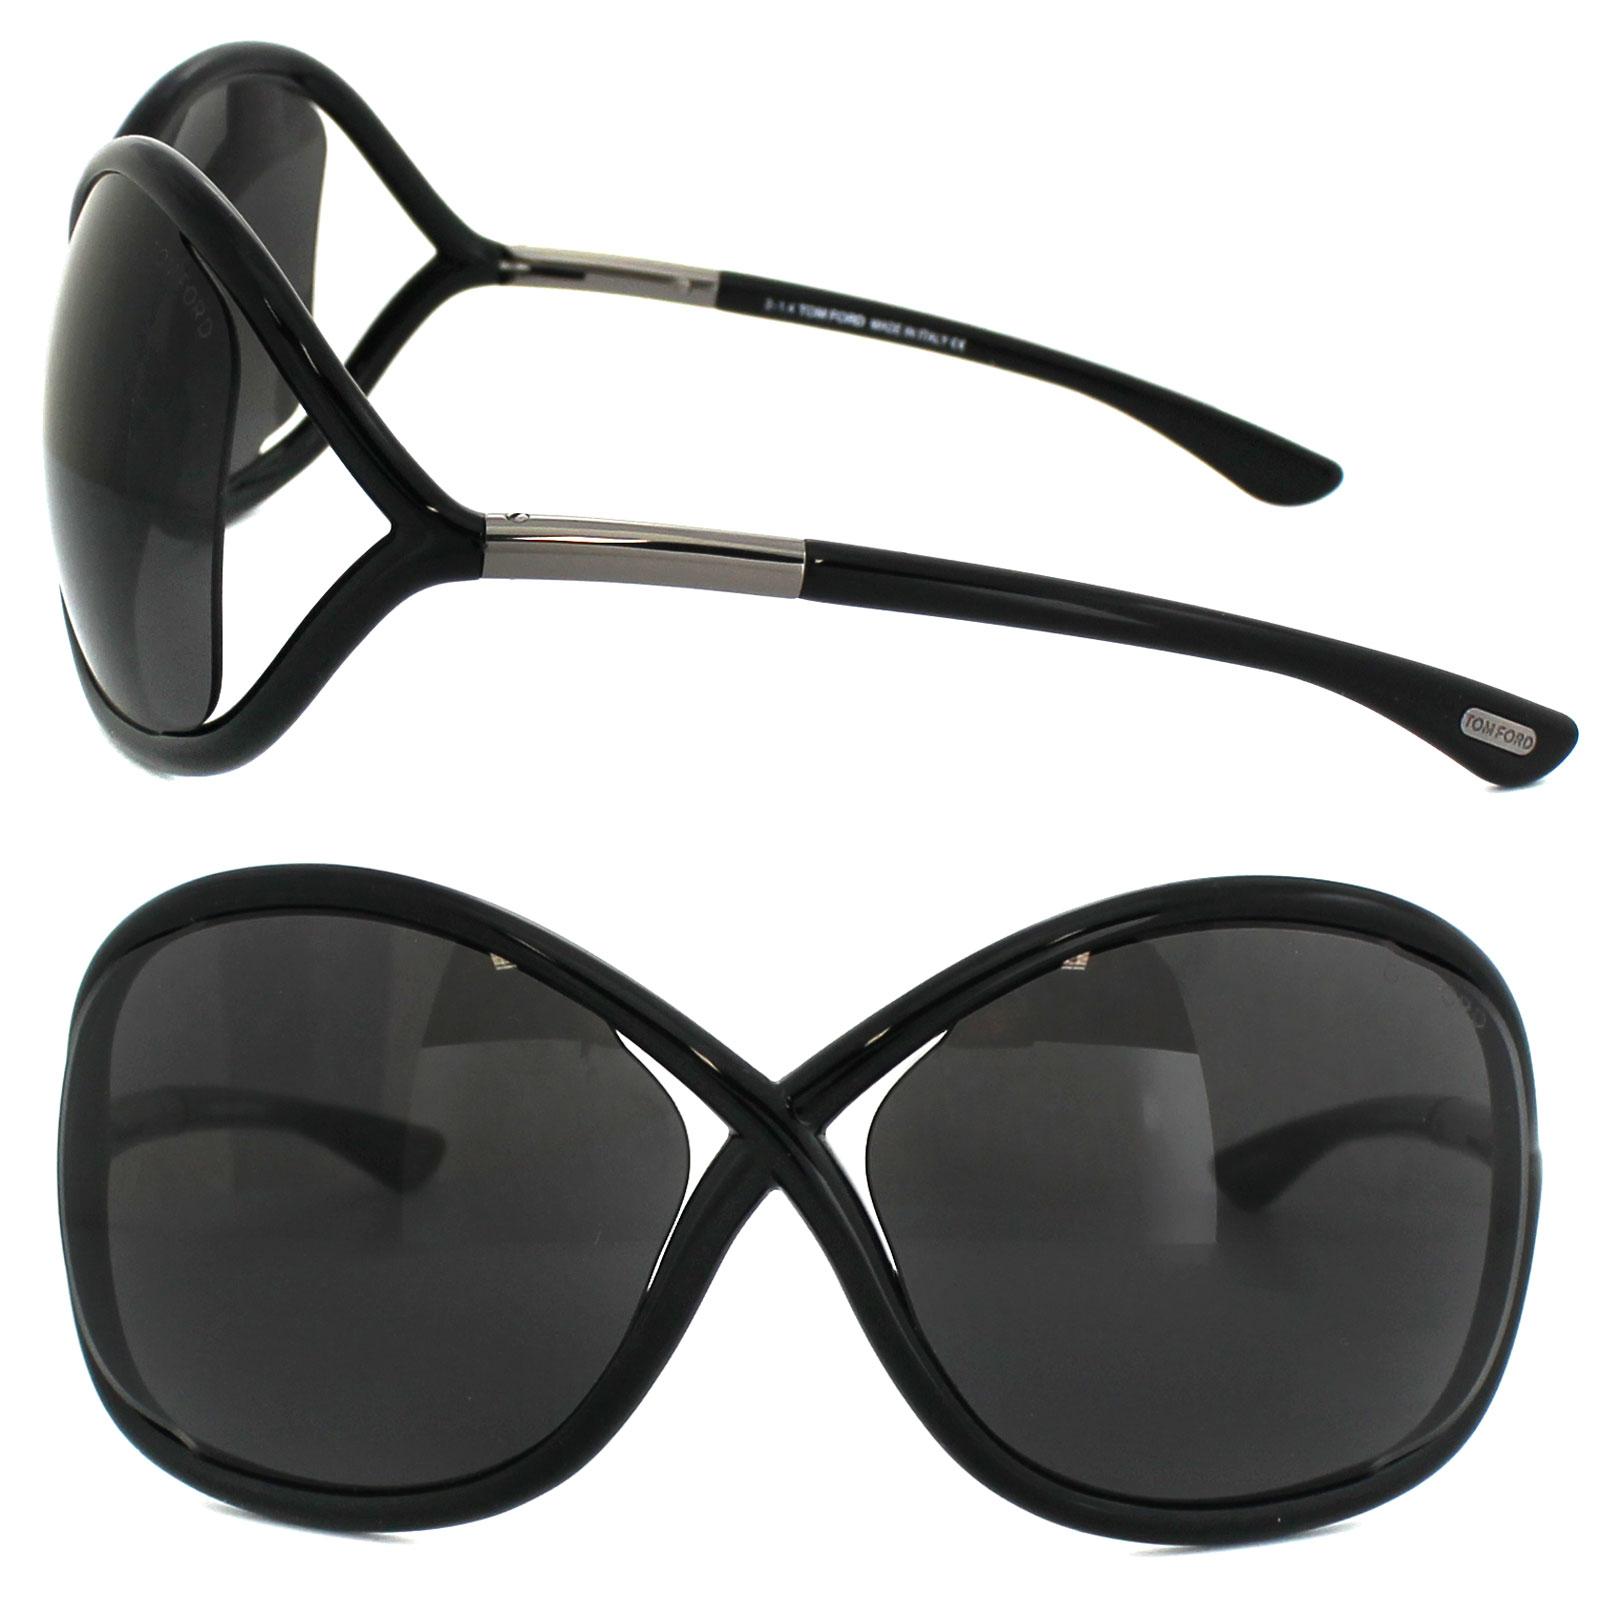 8aad5e21b2e Sentinel Tom Ford Sunglasses 0009 Whitney 199 Shiny Black Smoke Grey